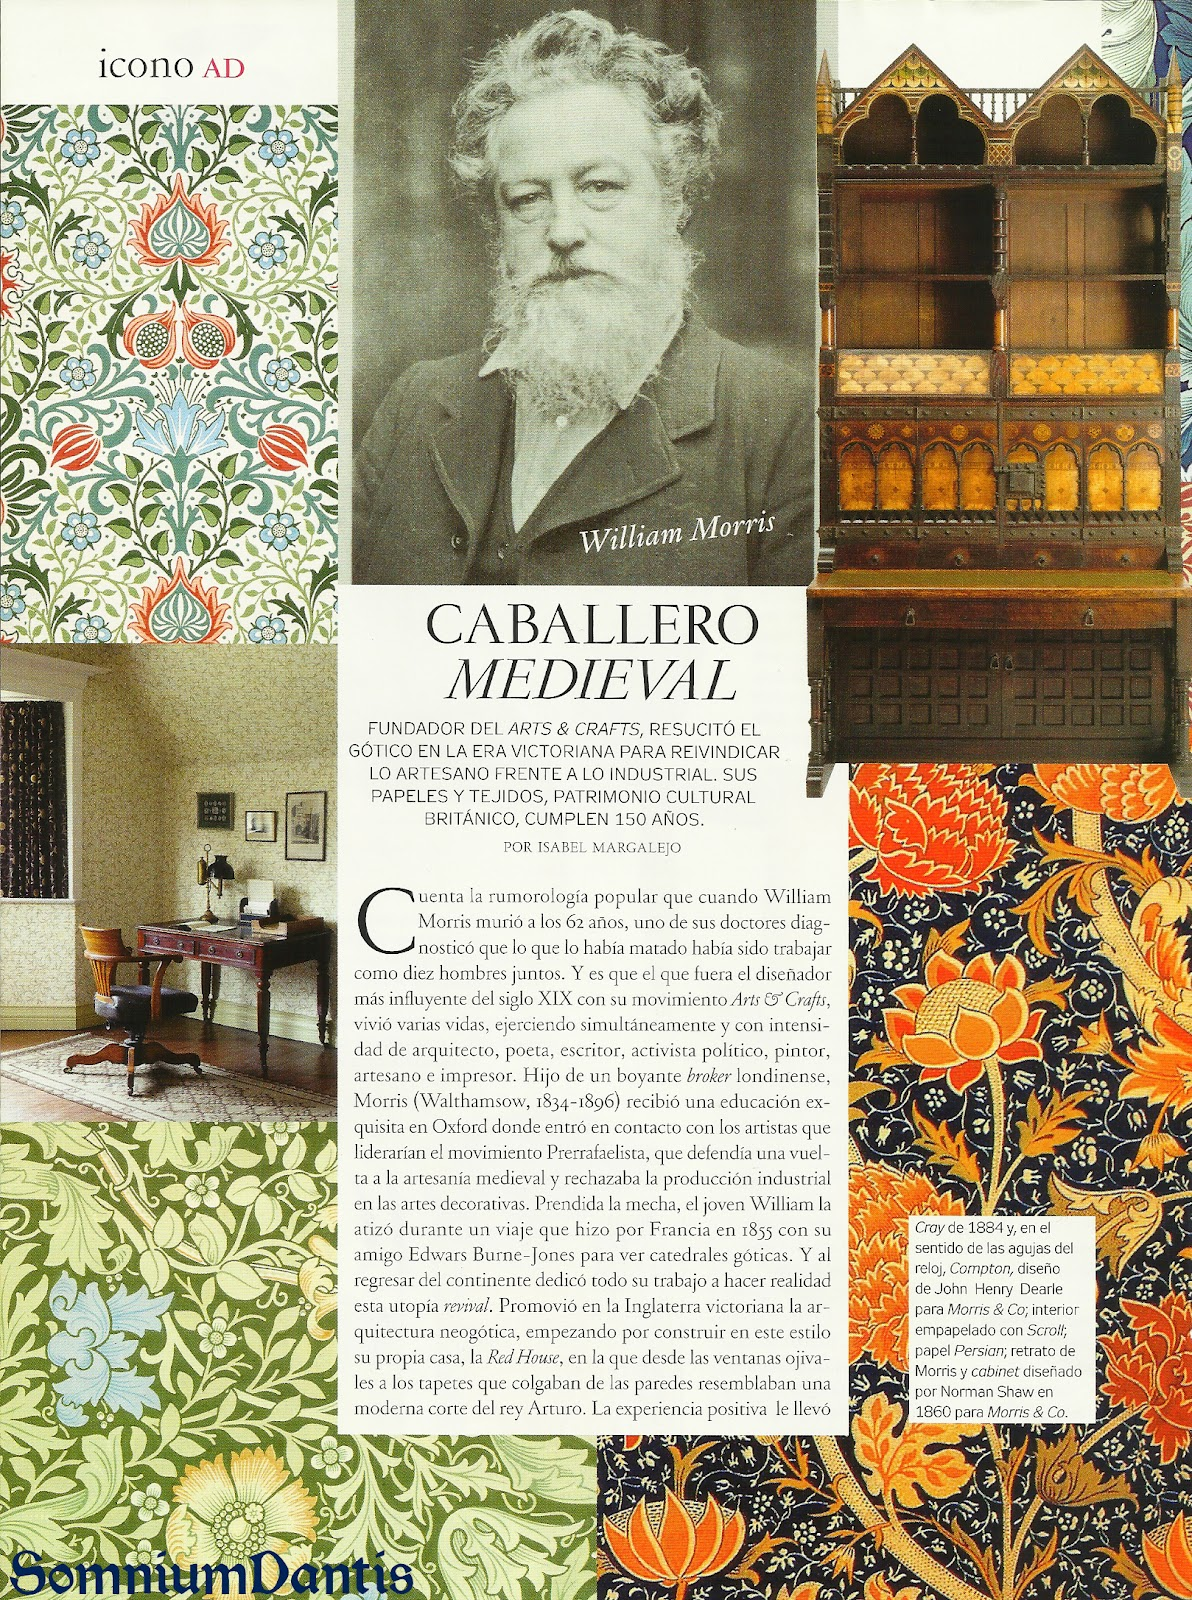 La discreta elegancia del siglo XIX inglés: Los Prerafaelitas - Página 2 Williammorris1